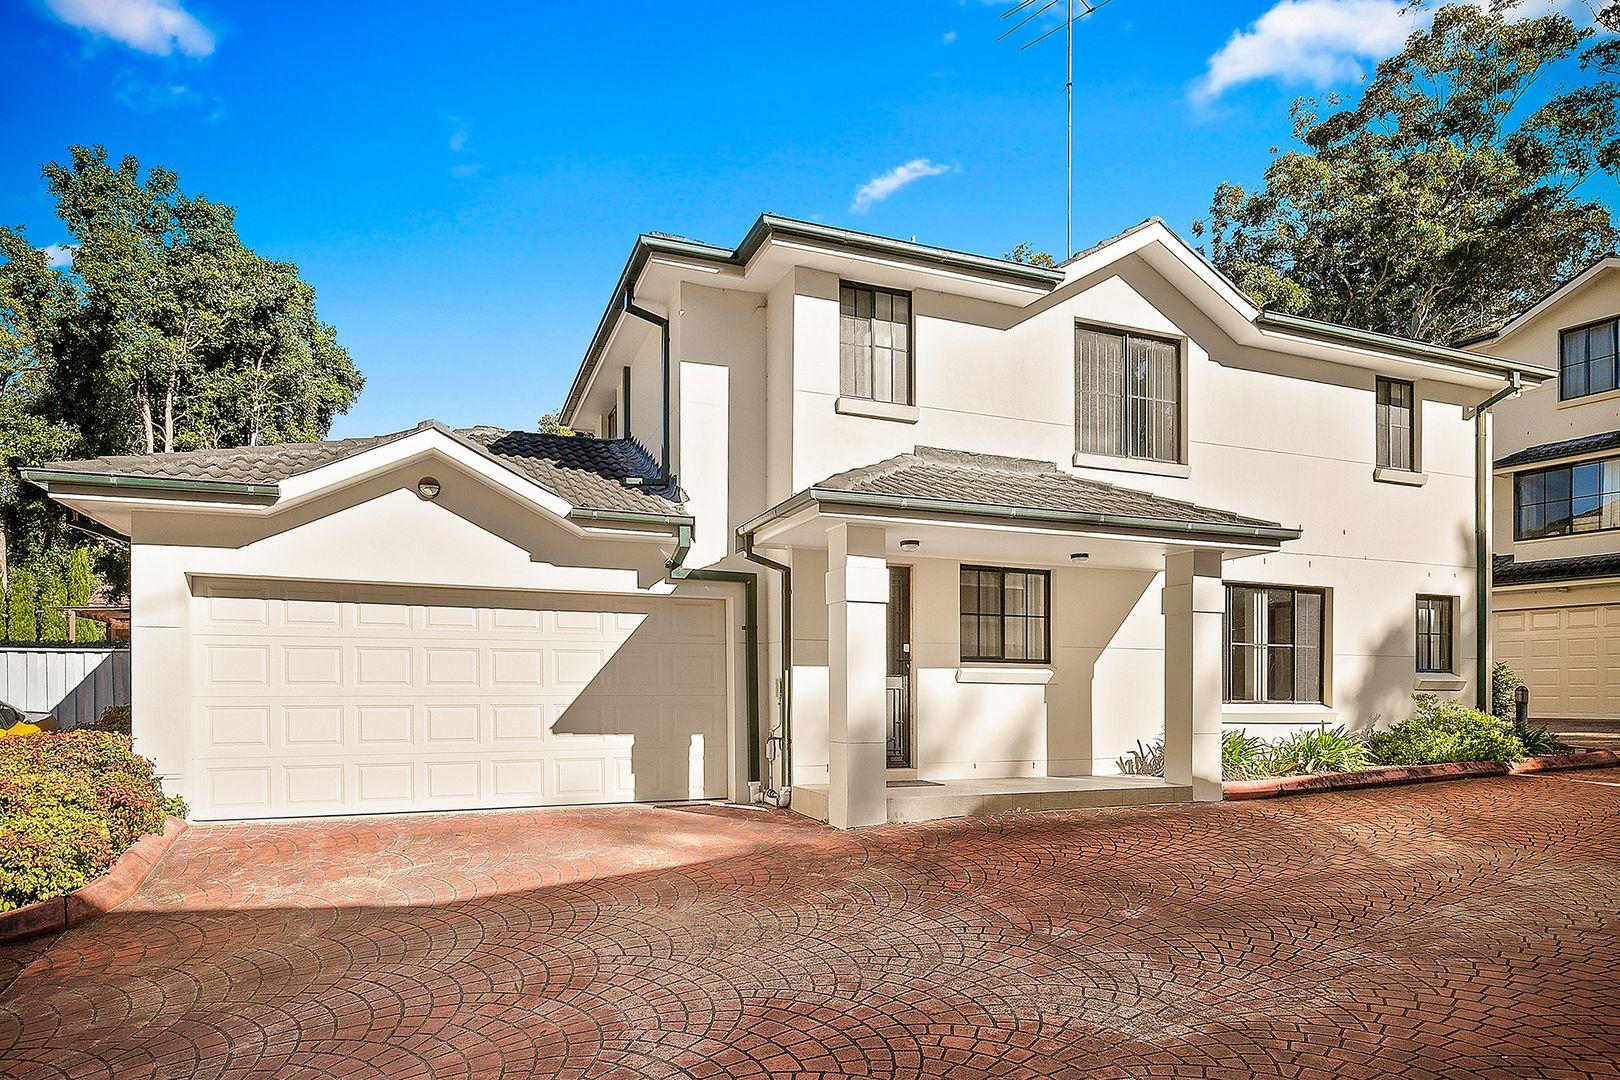 3/27 Cook Street, Baulkham Hills NSW 2153, Image 0